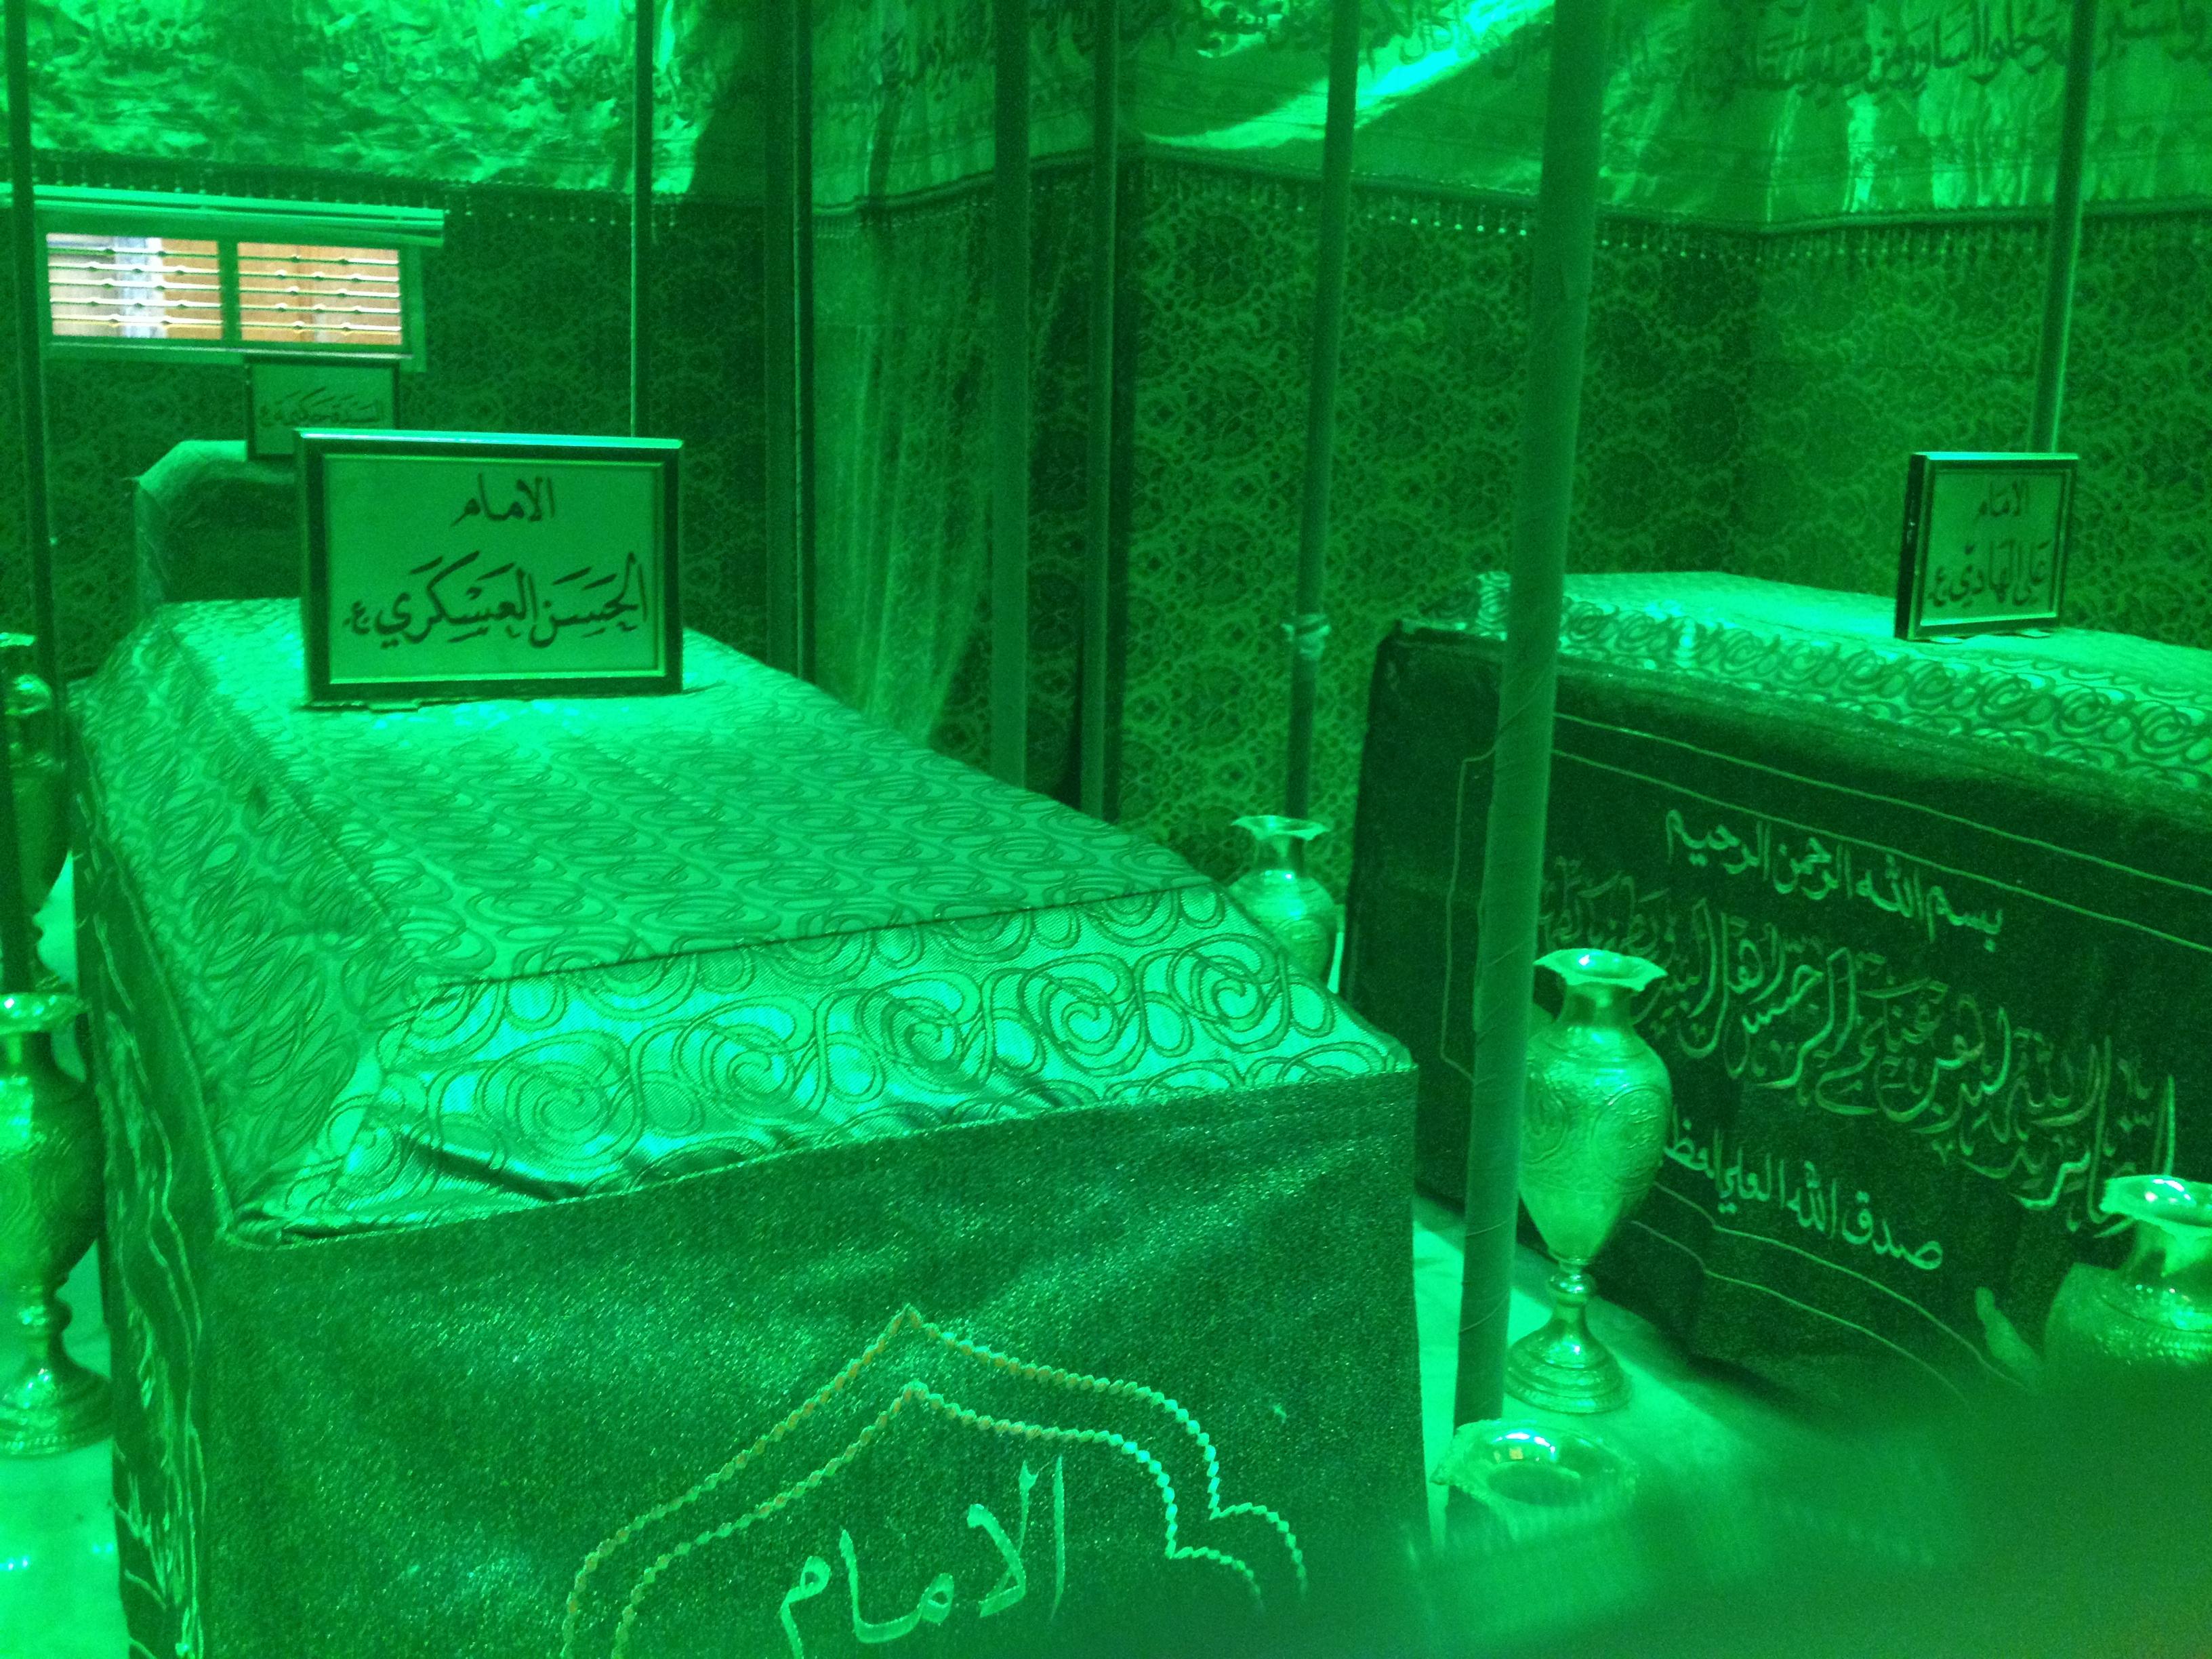 Imam hussain grave